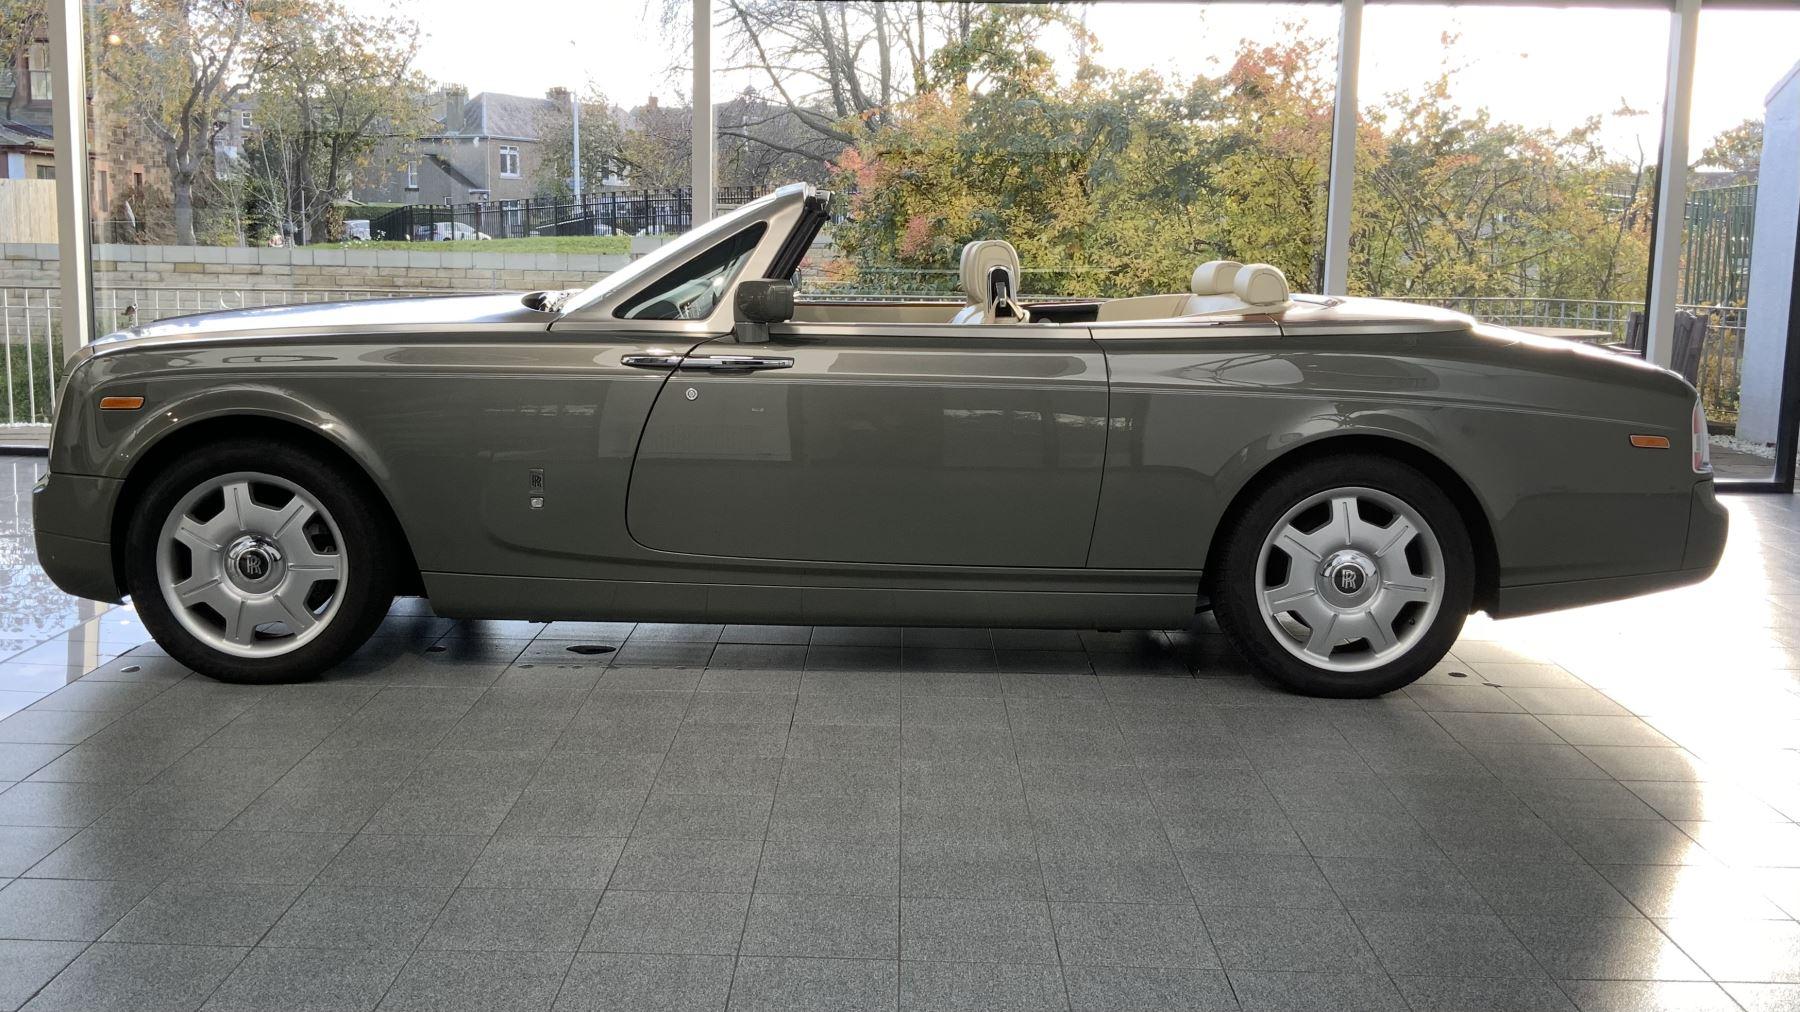 Rolls-Royce Phantom Drophead Coupe 2dr Auto 6.7 Automatic Convertible (2008)